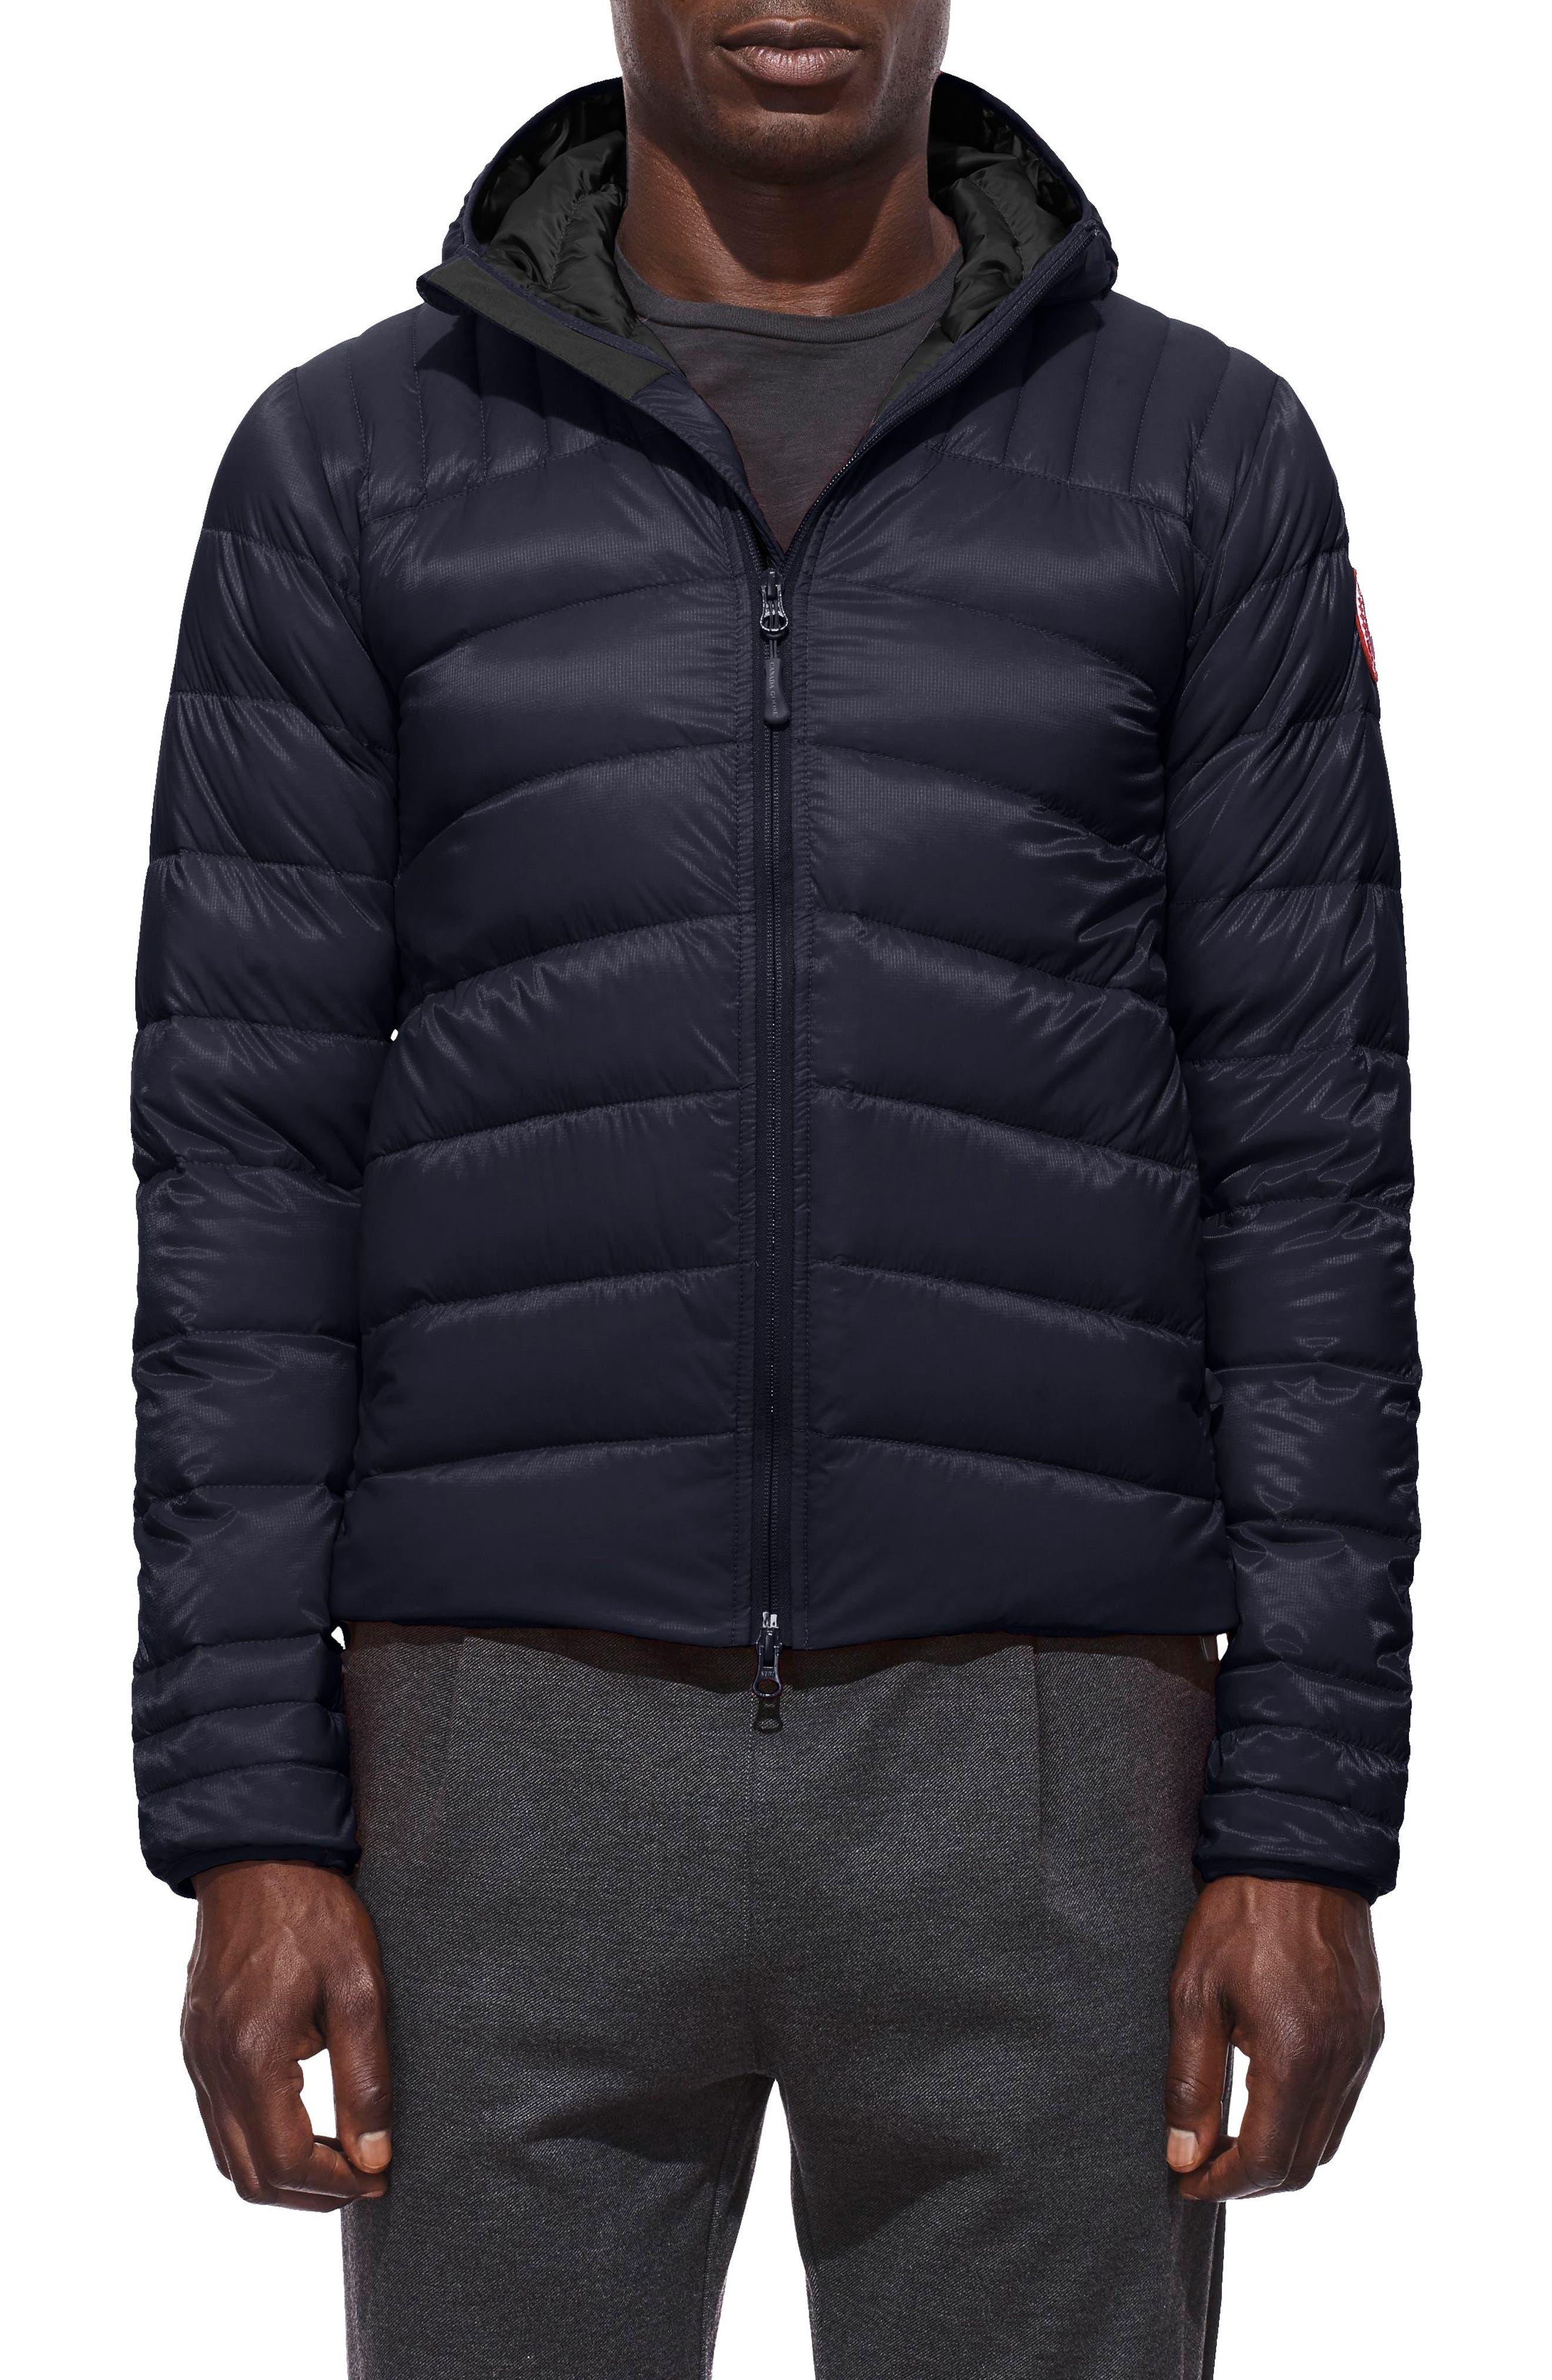 CANADA GOOSE Brookvale Slim Fit Hooded Down Jacket, Main, color, ADMIRAL BLUE/ BLACK